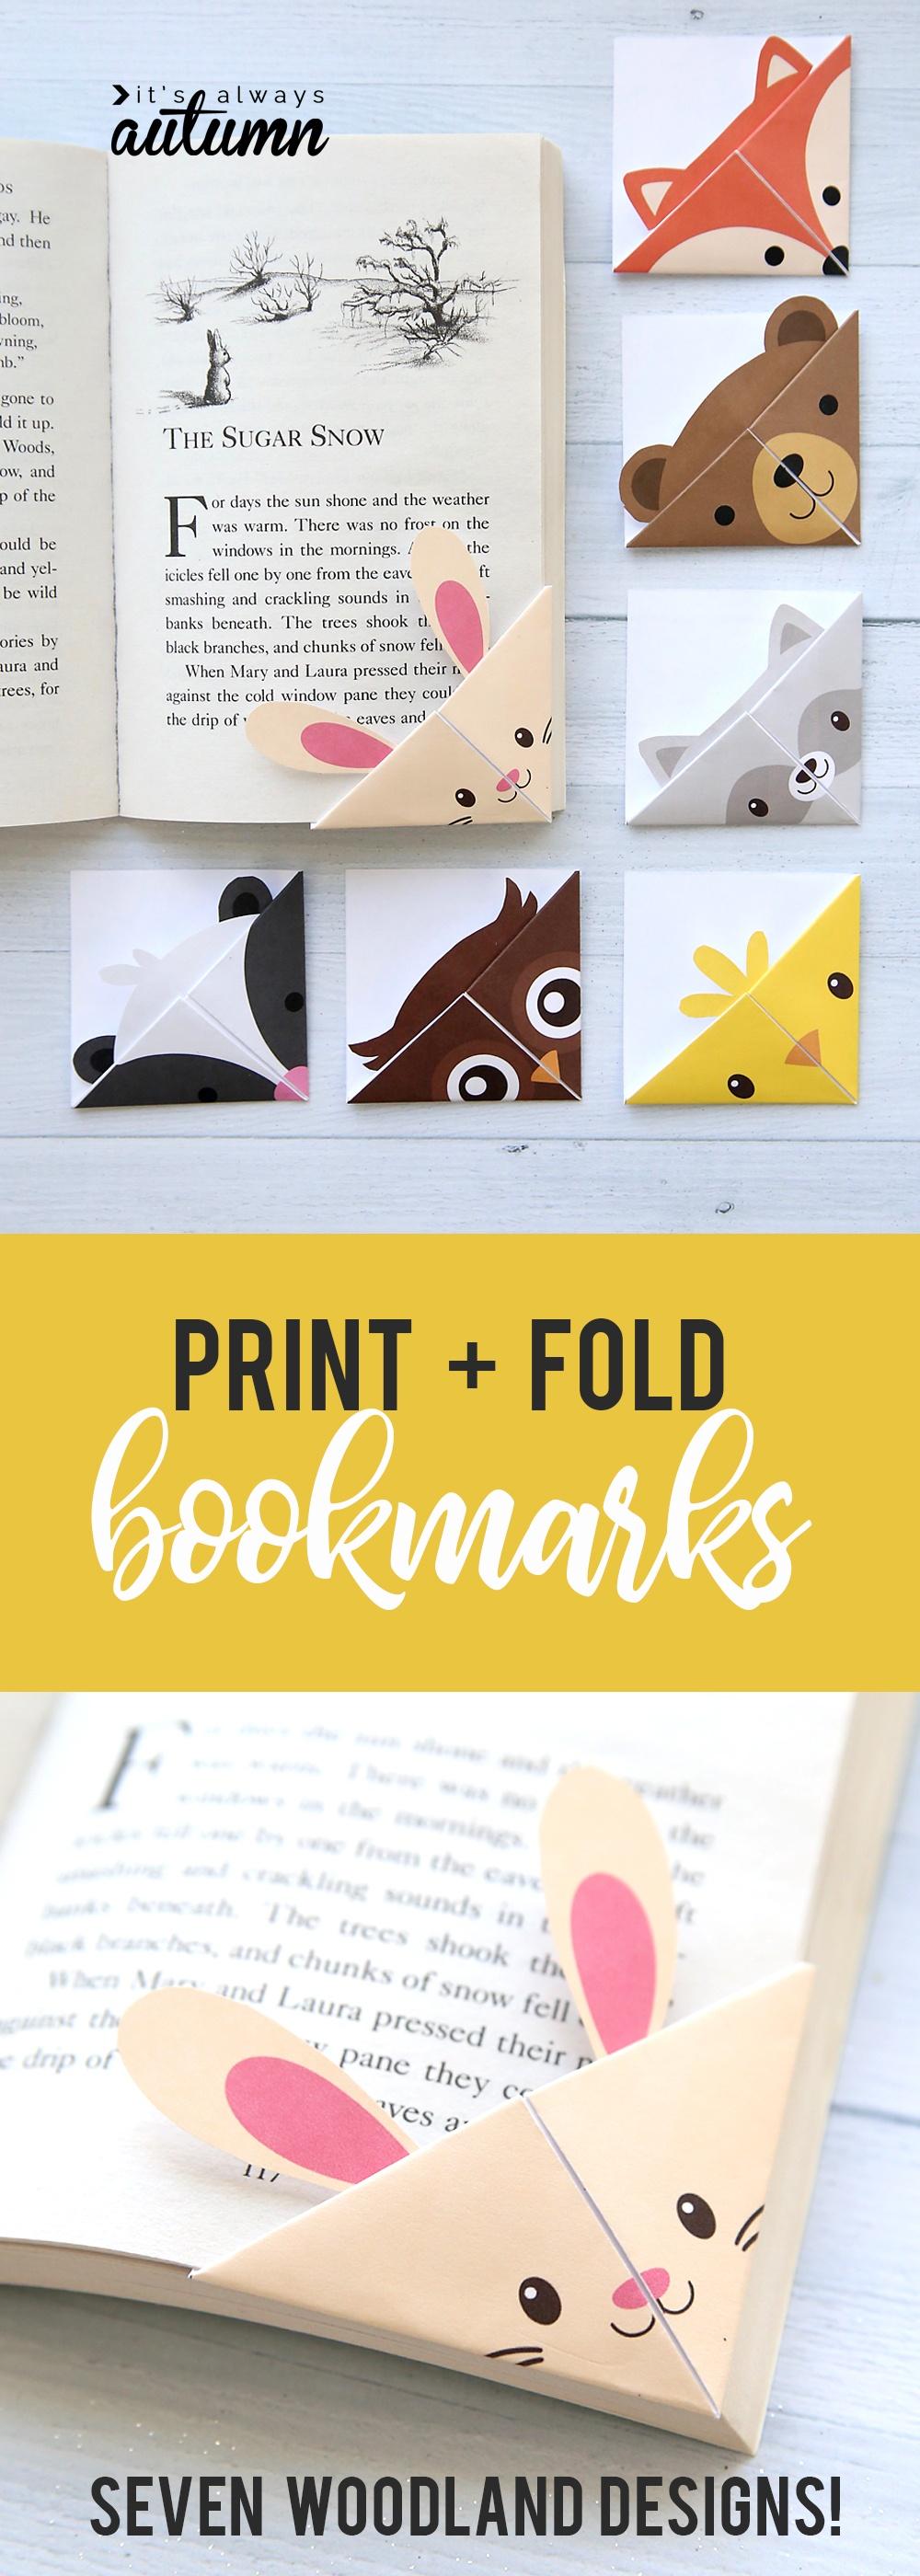 Diy Woodland Animals Origami Bookmarks {Print + Fold} - It's Always - Free Printable Woodland Animal Templates